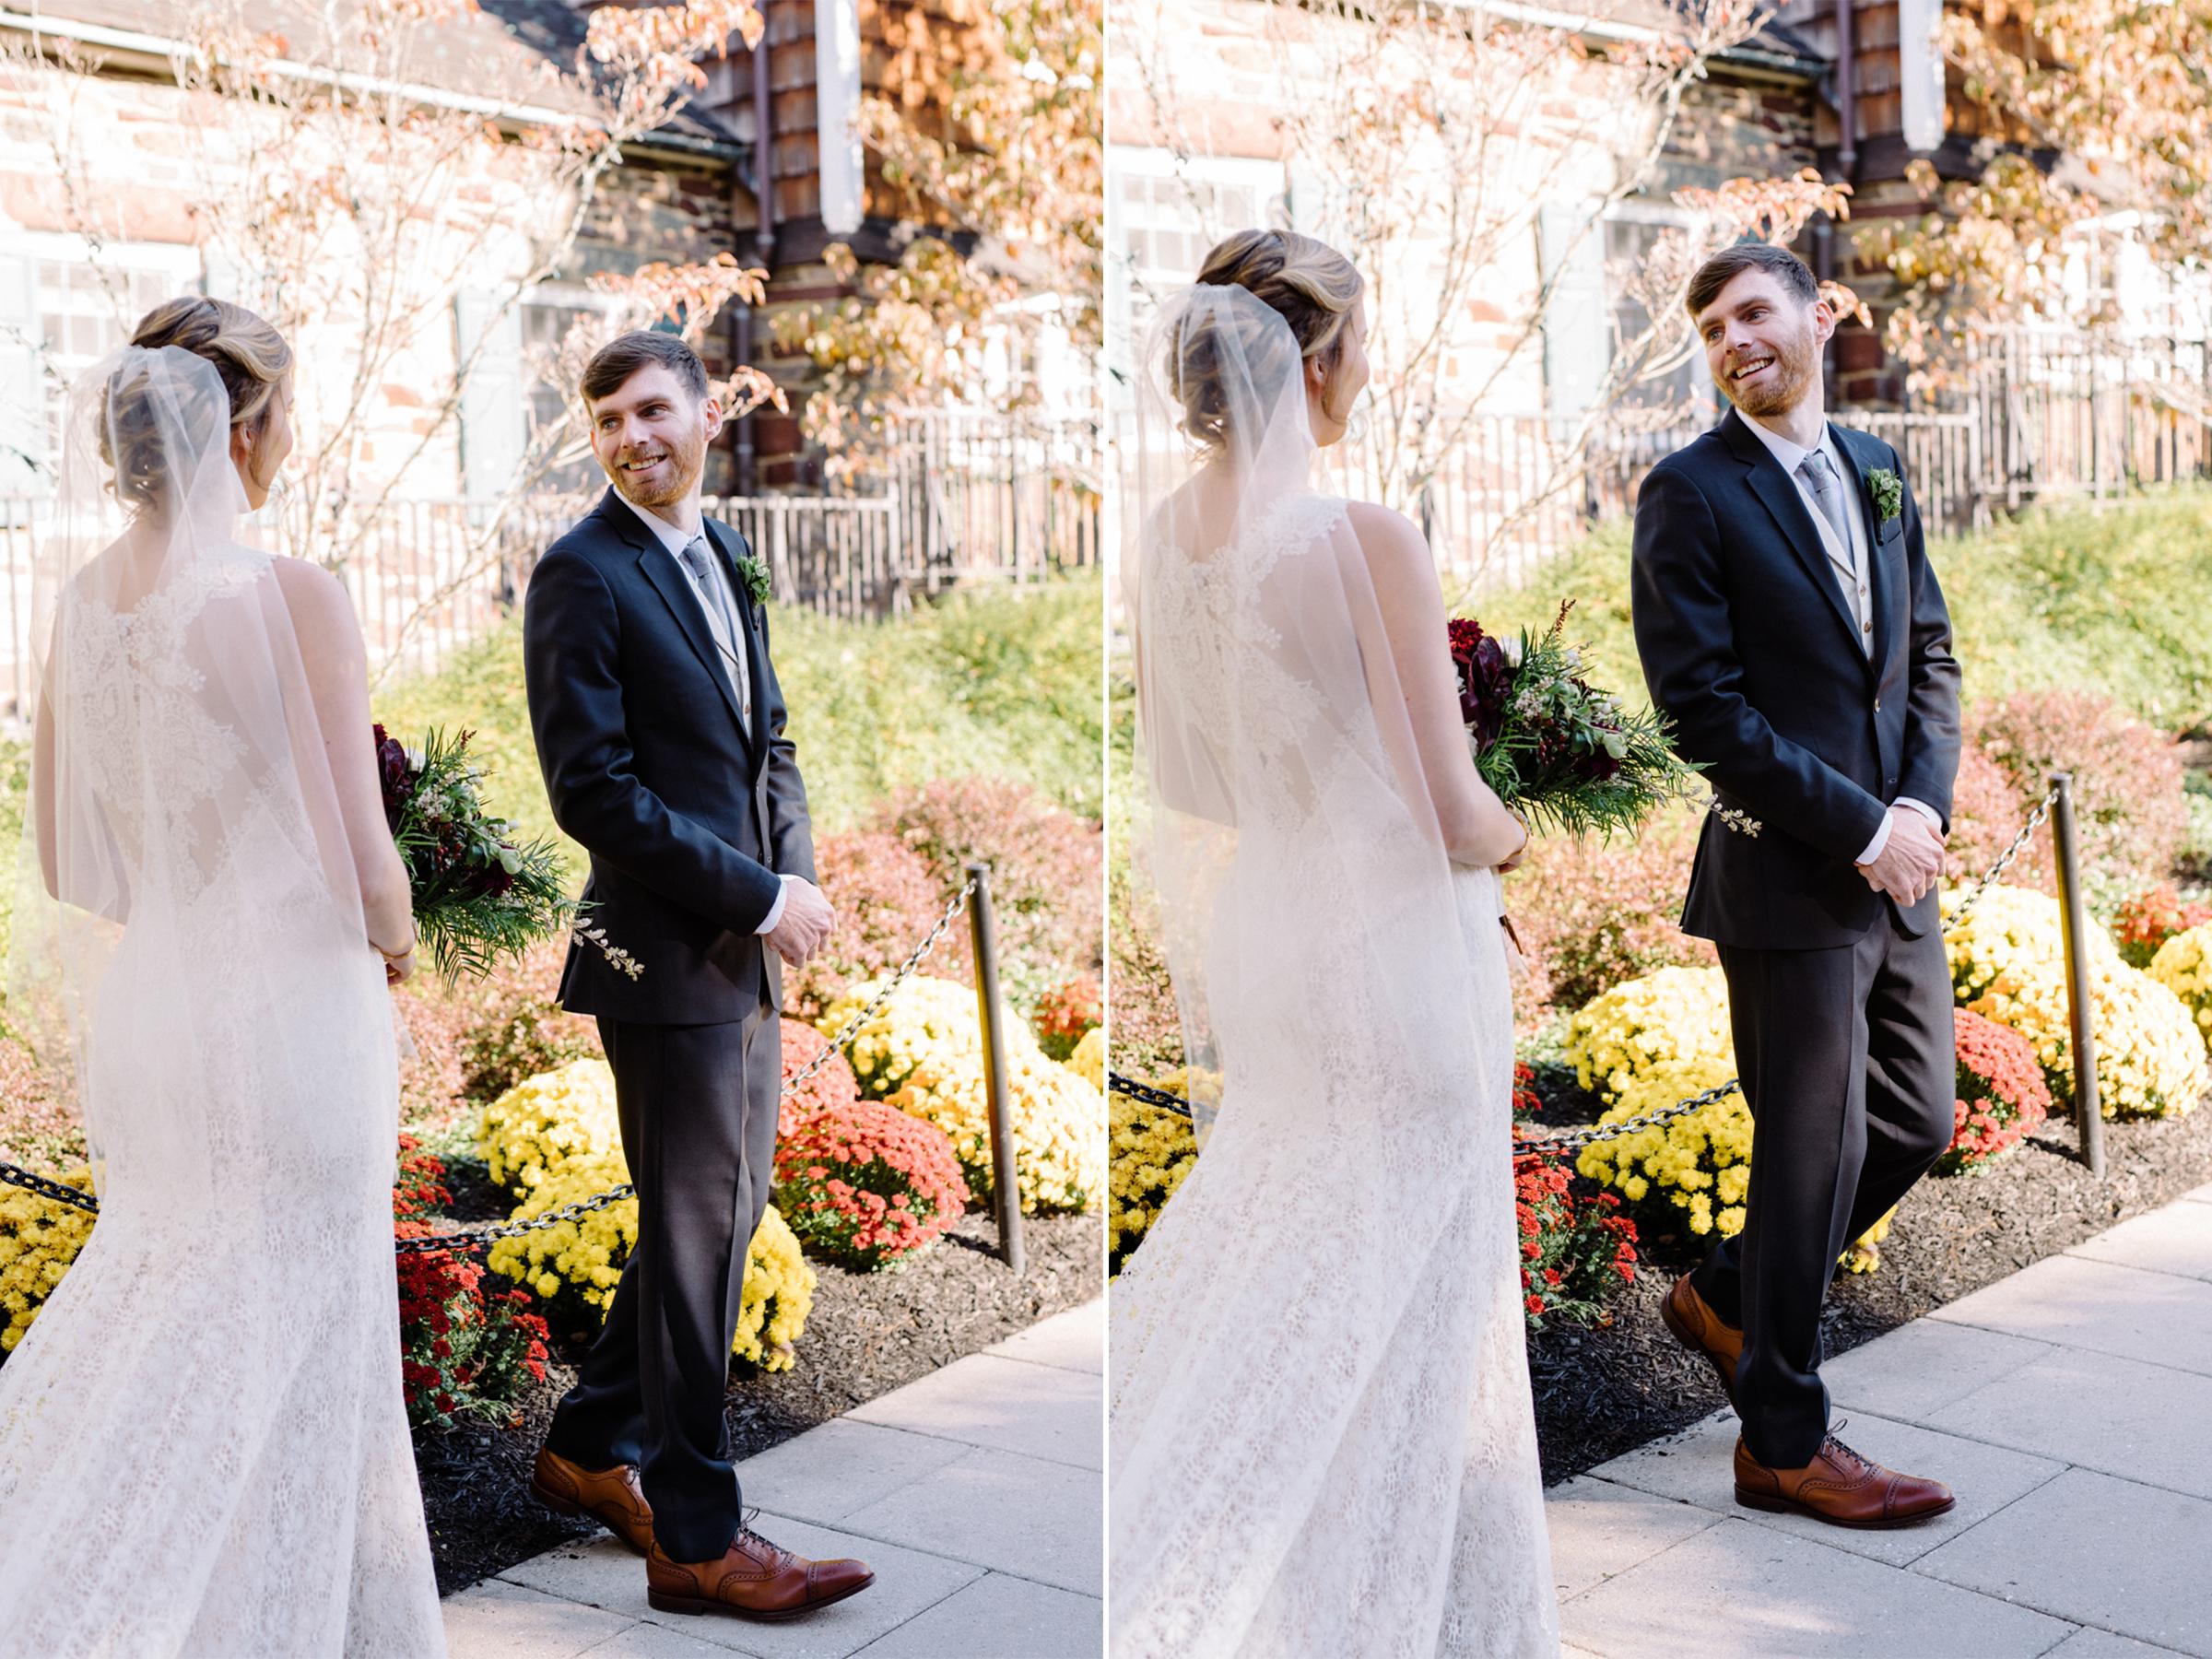 Chelsea+James- First Look- Nassau Inn Princeton Wedding- Olivia Christina Photo.jpg